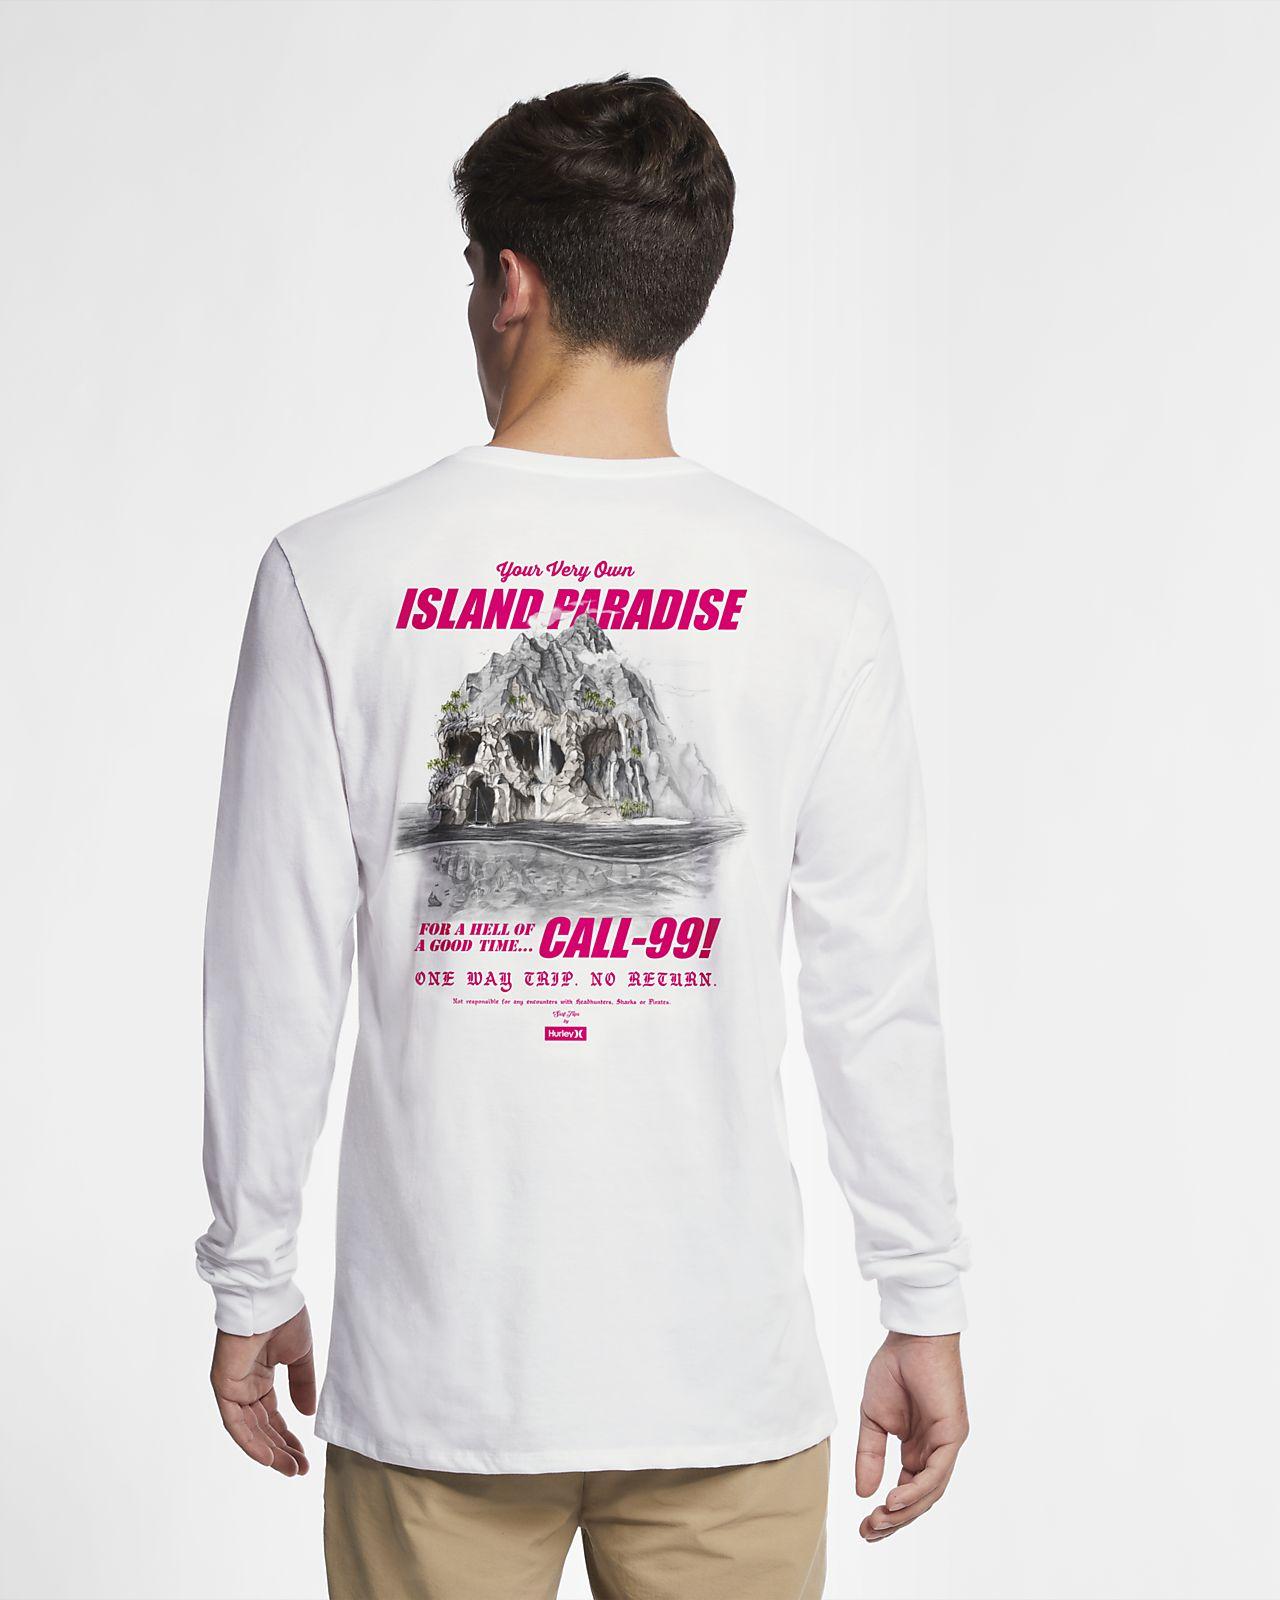 À Pour Island Longues Skull Tee Homme Hurley Premium Manches Shirt Sn8qwCxU57